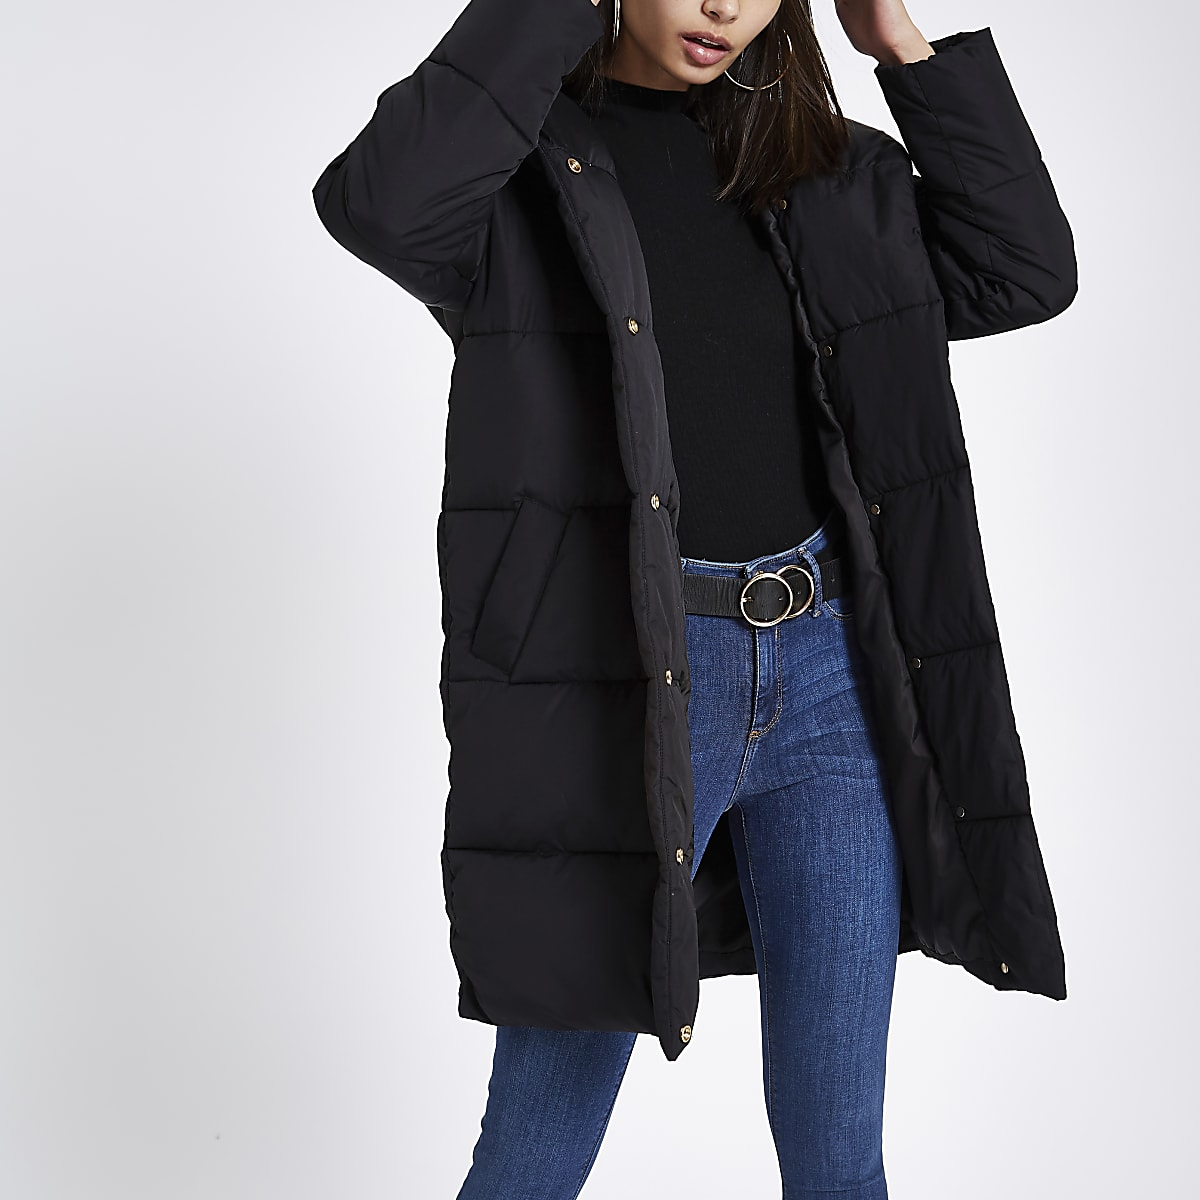 a6938d1531b Black asymmetric longline puffer jacket